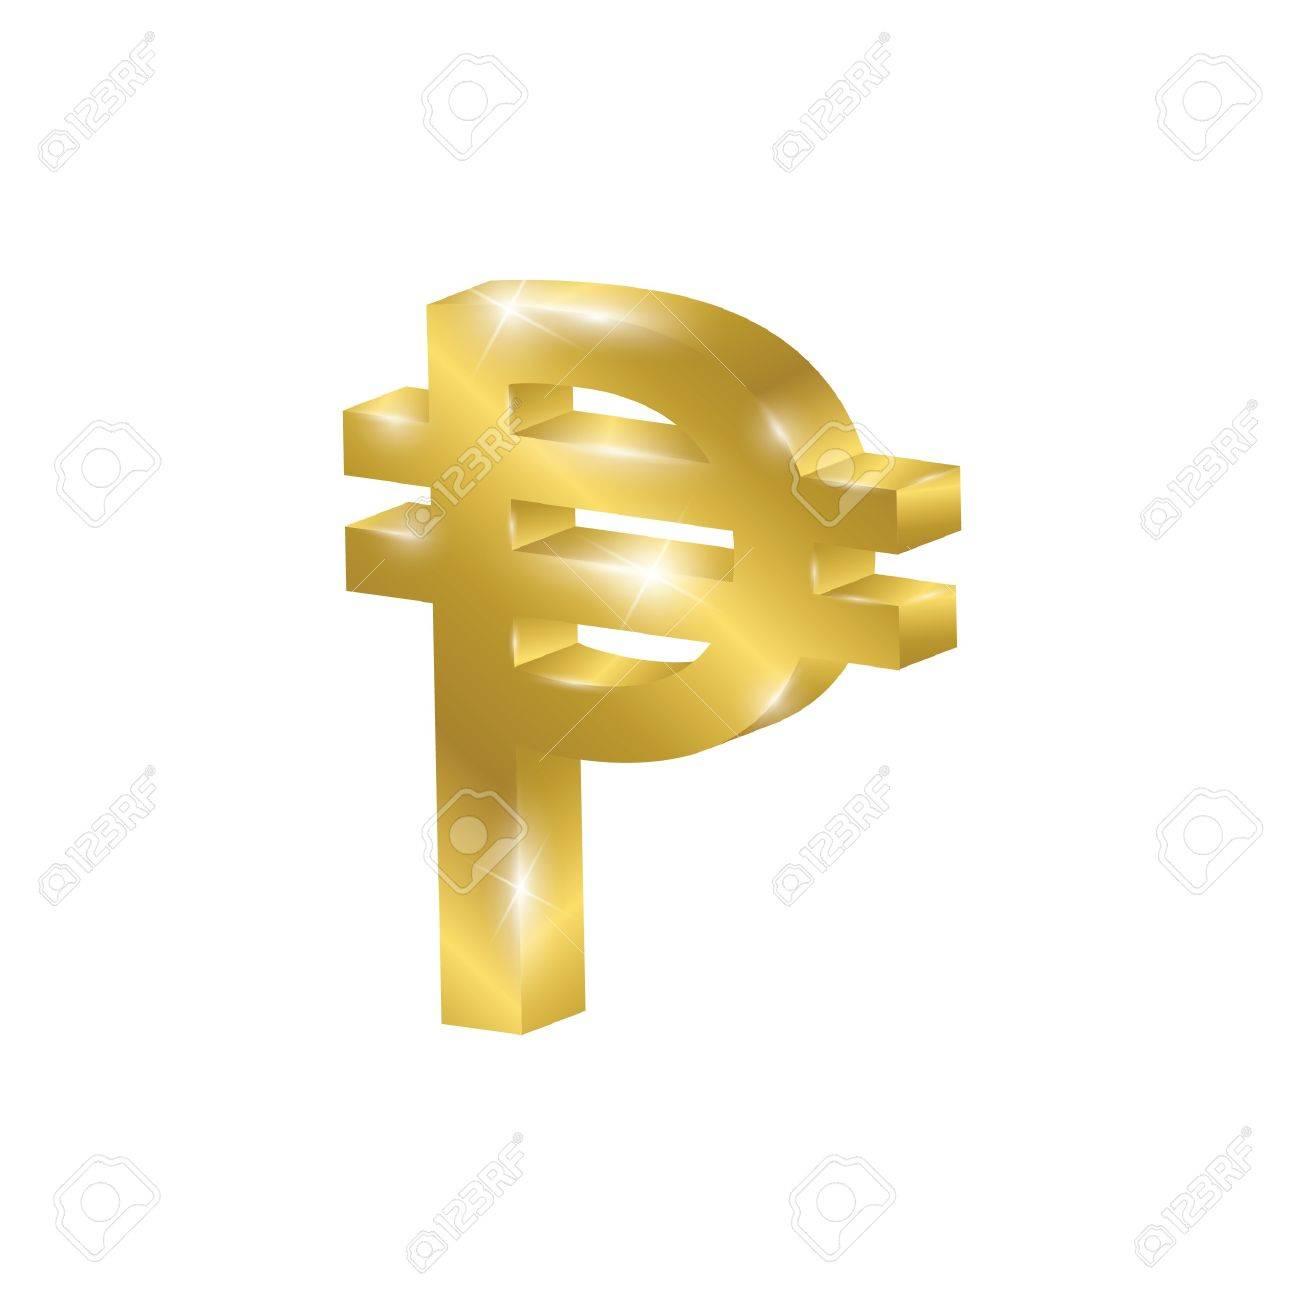 Mexican Pesos Symbol Royalty Free Cliparts Vetores E Ilustraes